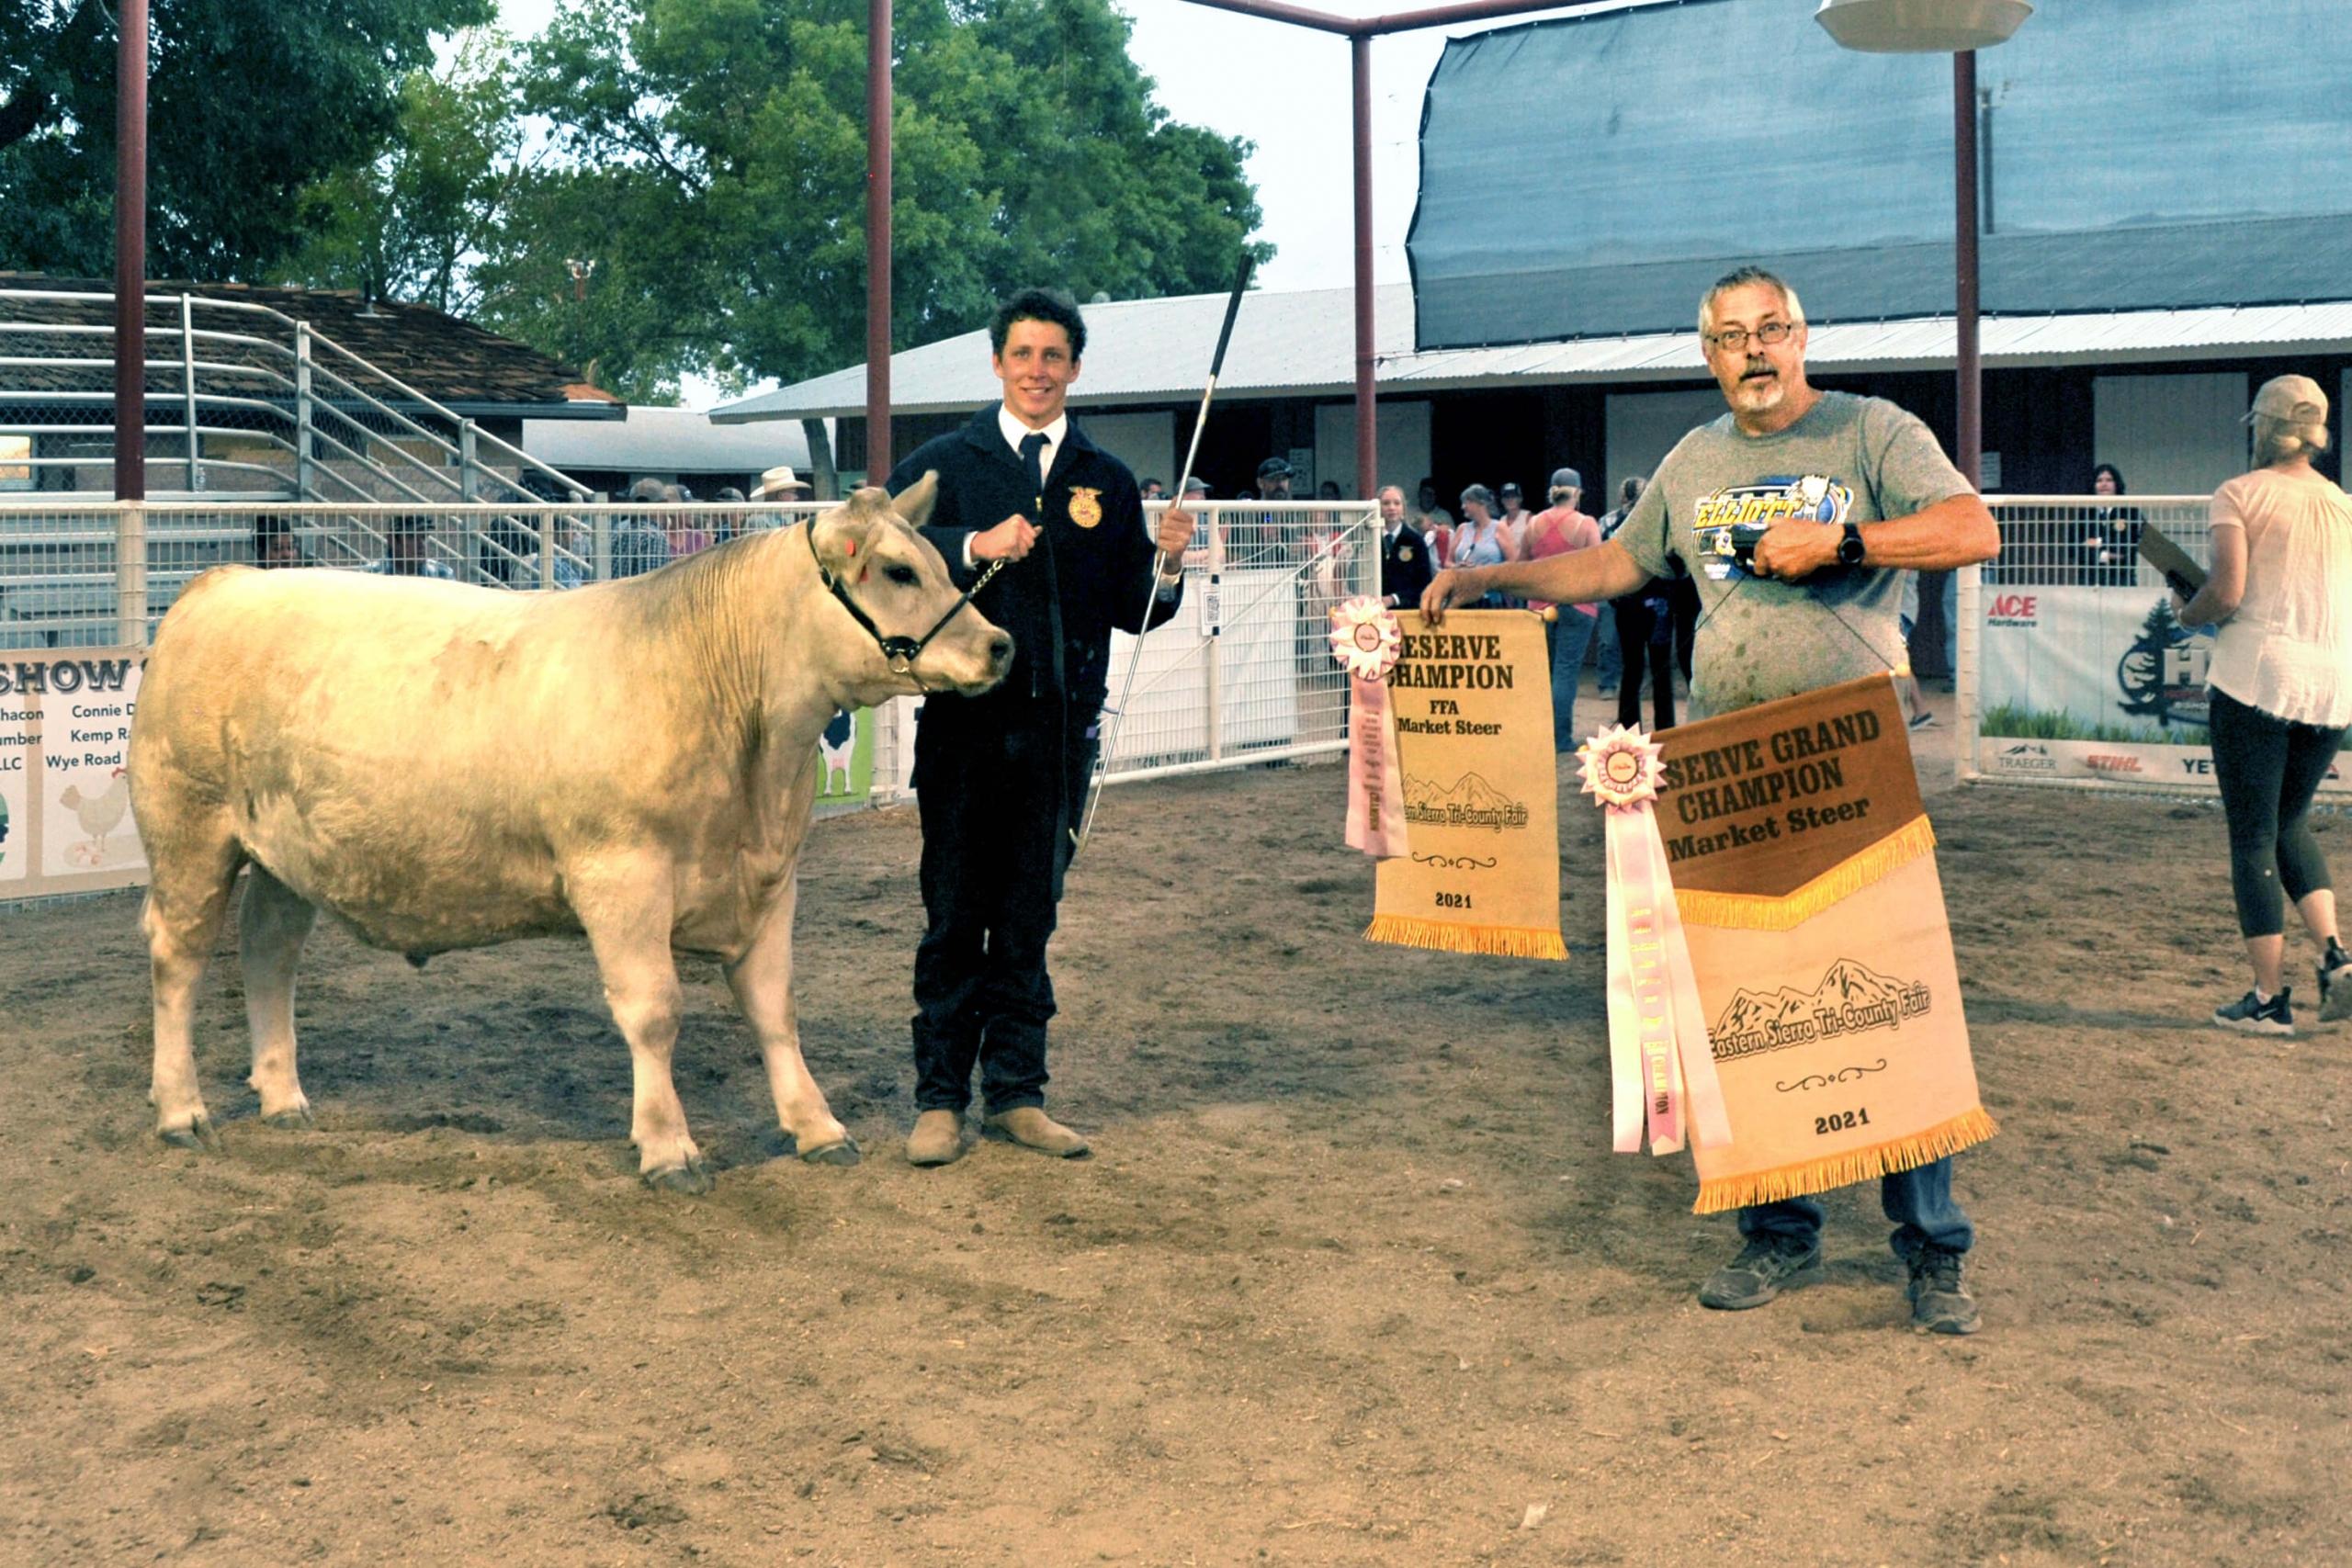 Conner Holland - Reserve Champ Steer